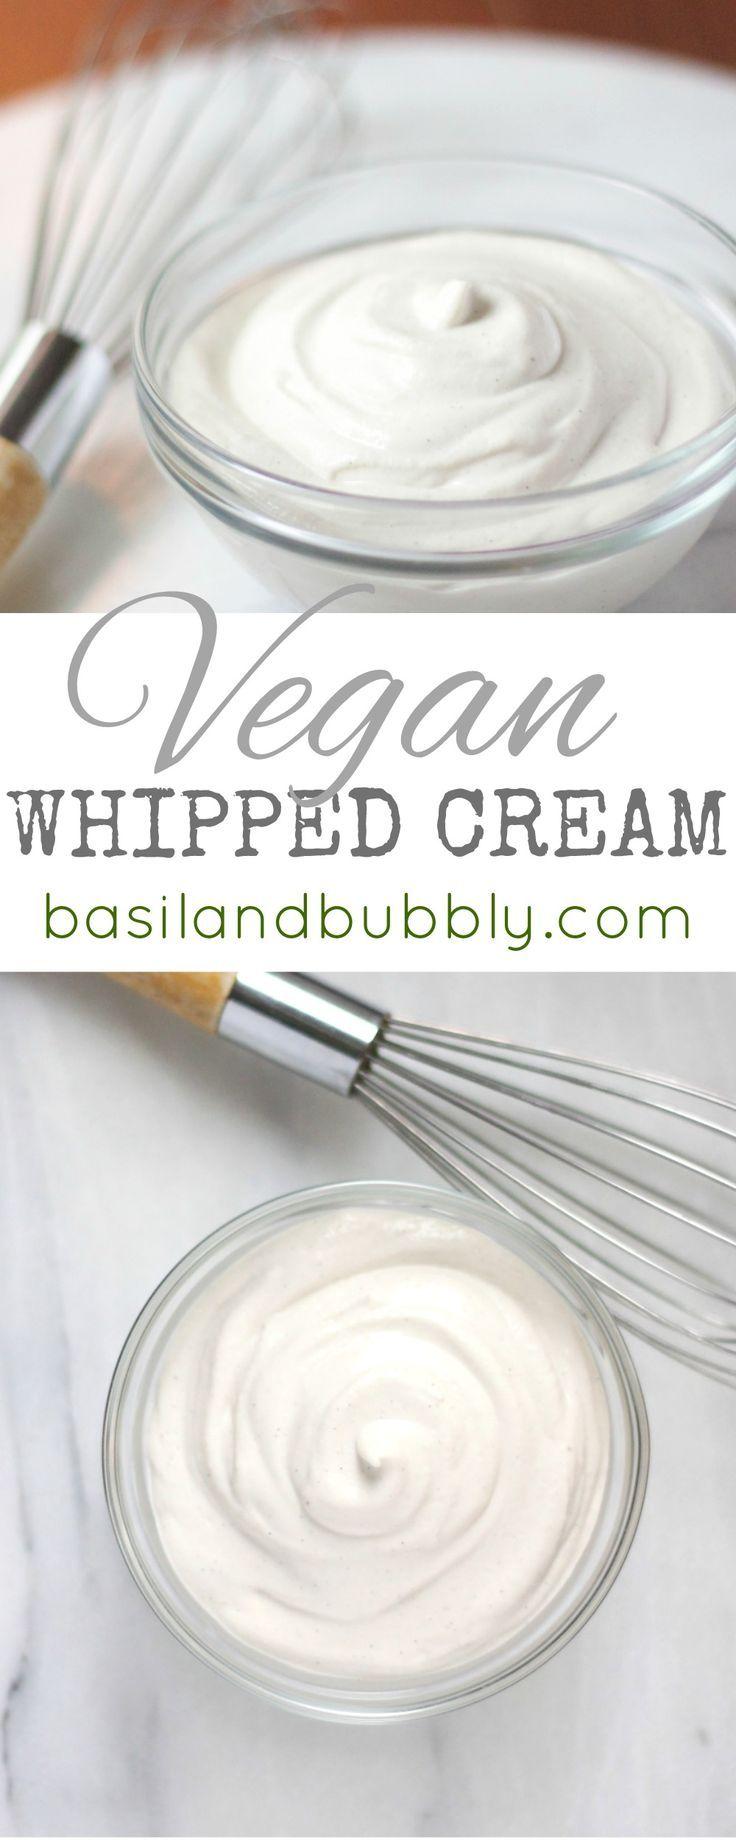 Delicious, creamy, decadent, raw and vegan whipped cream recipe